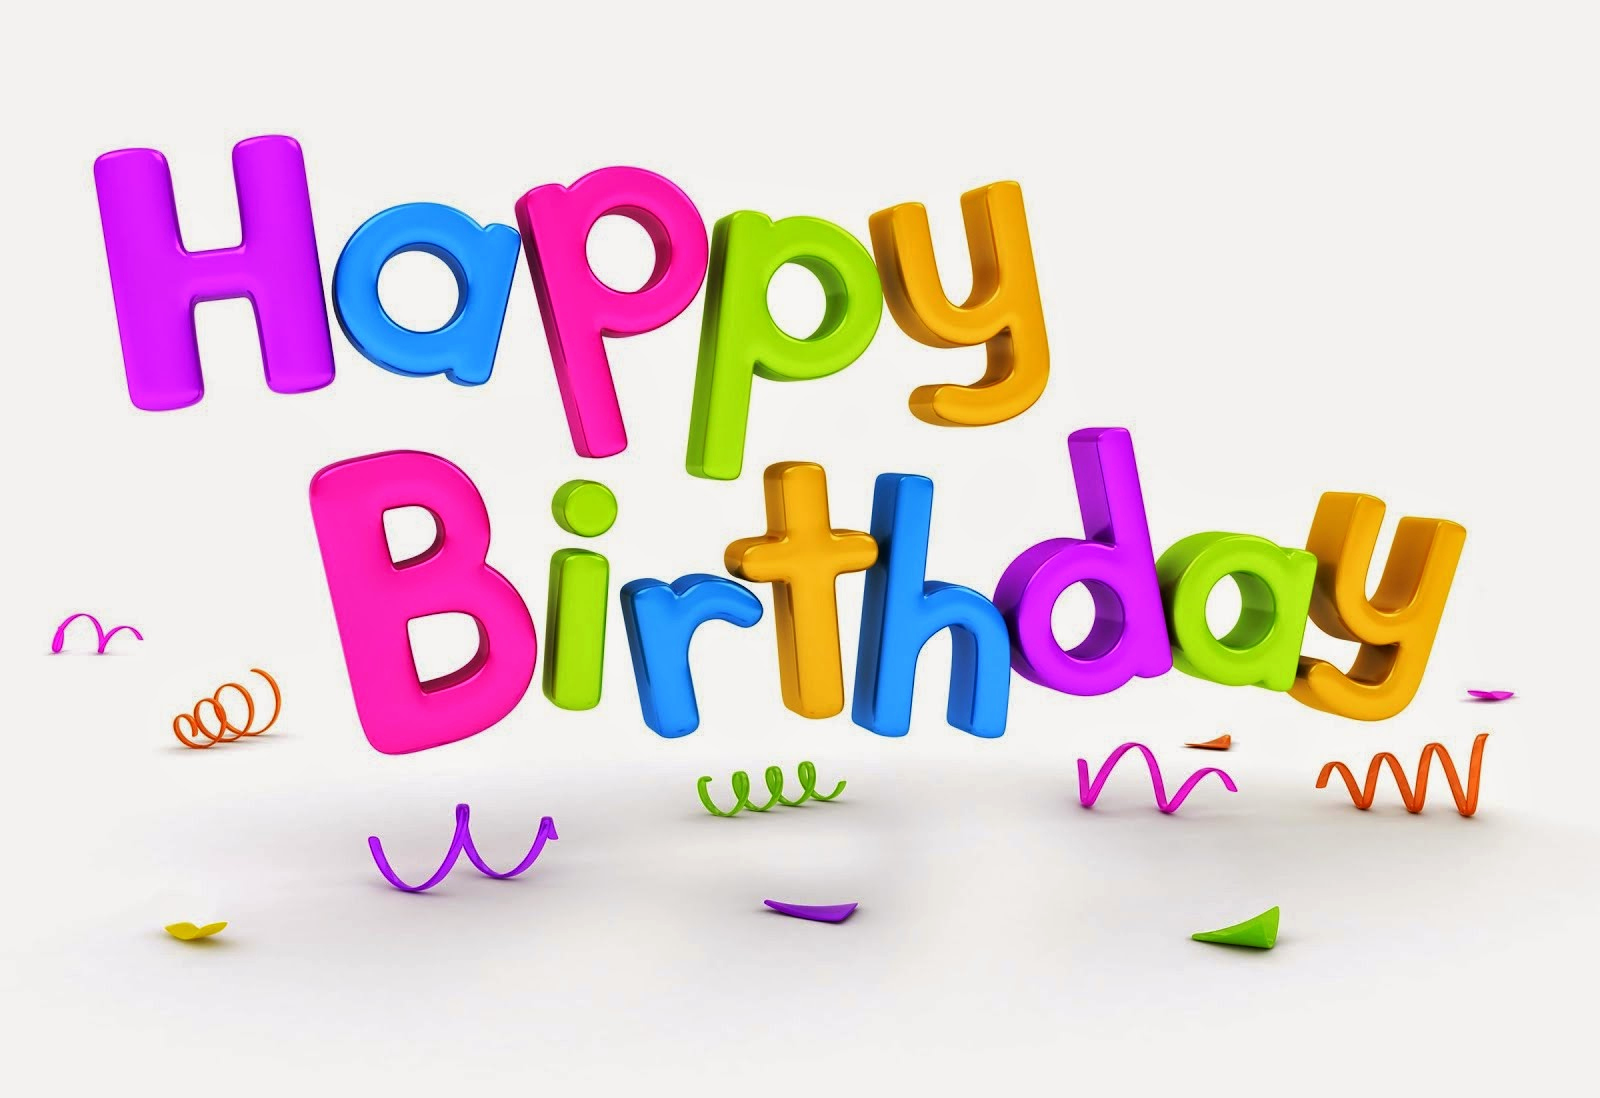 Happy Bday Wallpapers Free Awesome Wallpaper Happy Birthday Selamat Ulang Tahun